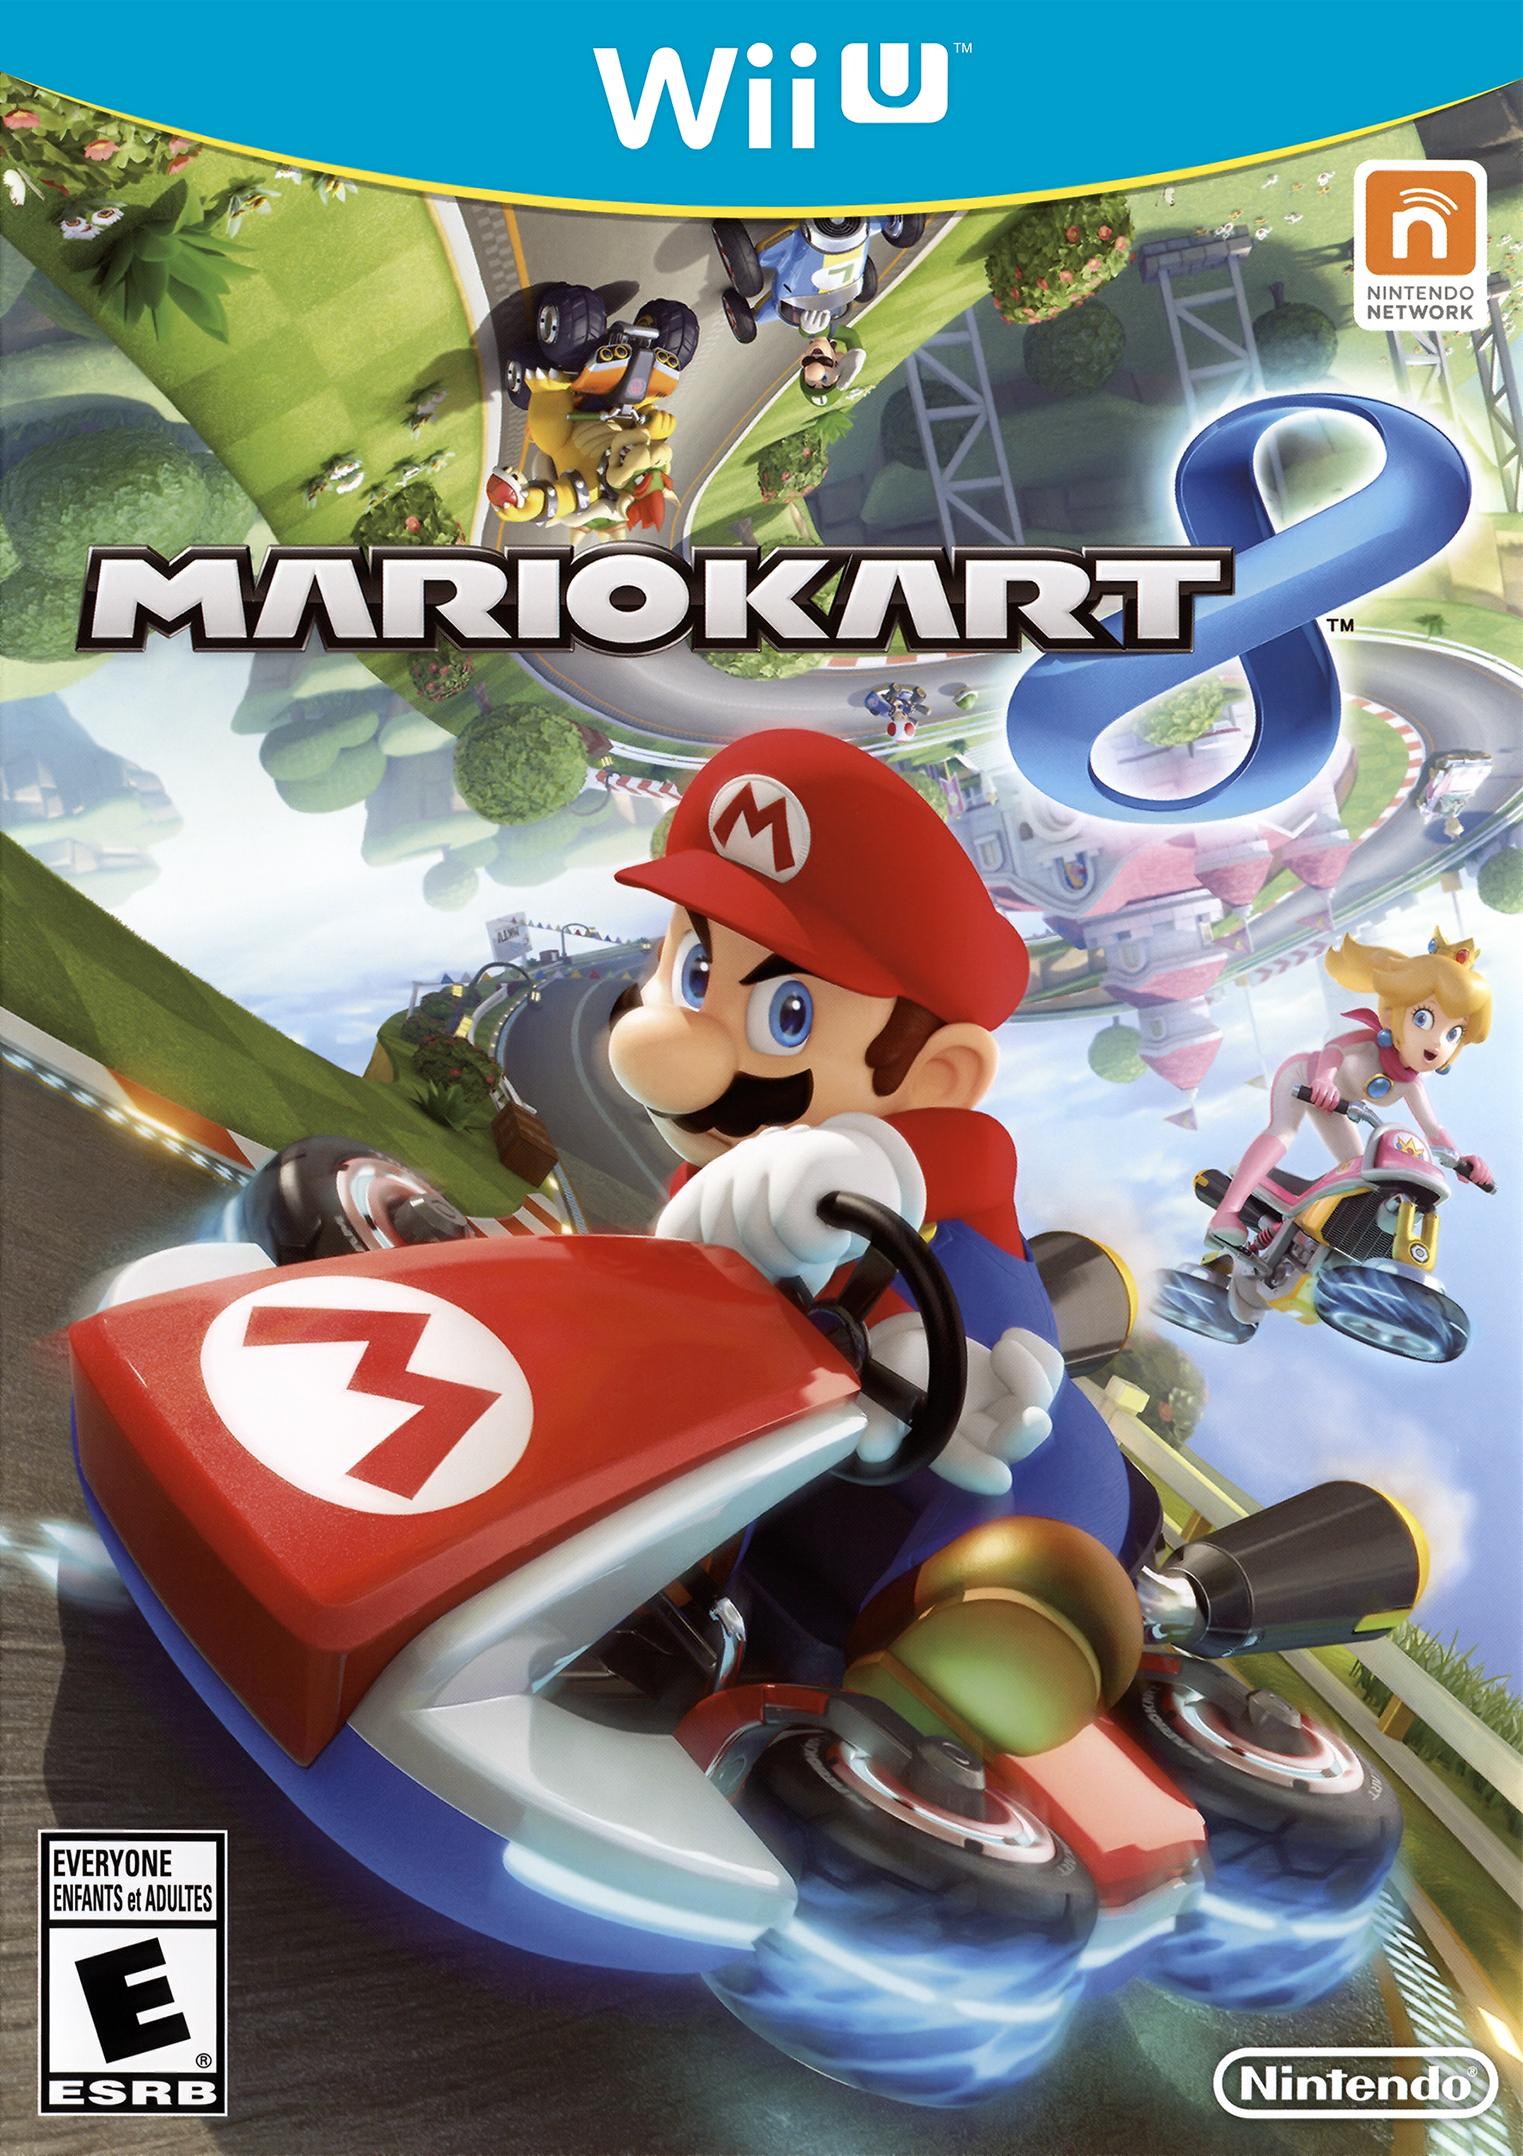 Mario Kart 8 Strategywiki The Video Game Walkthrough And